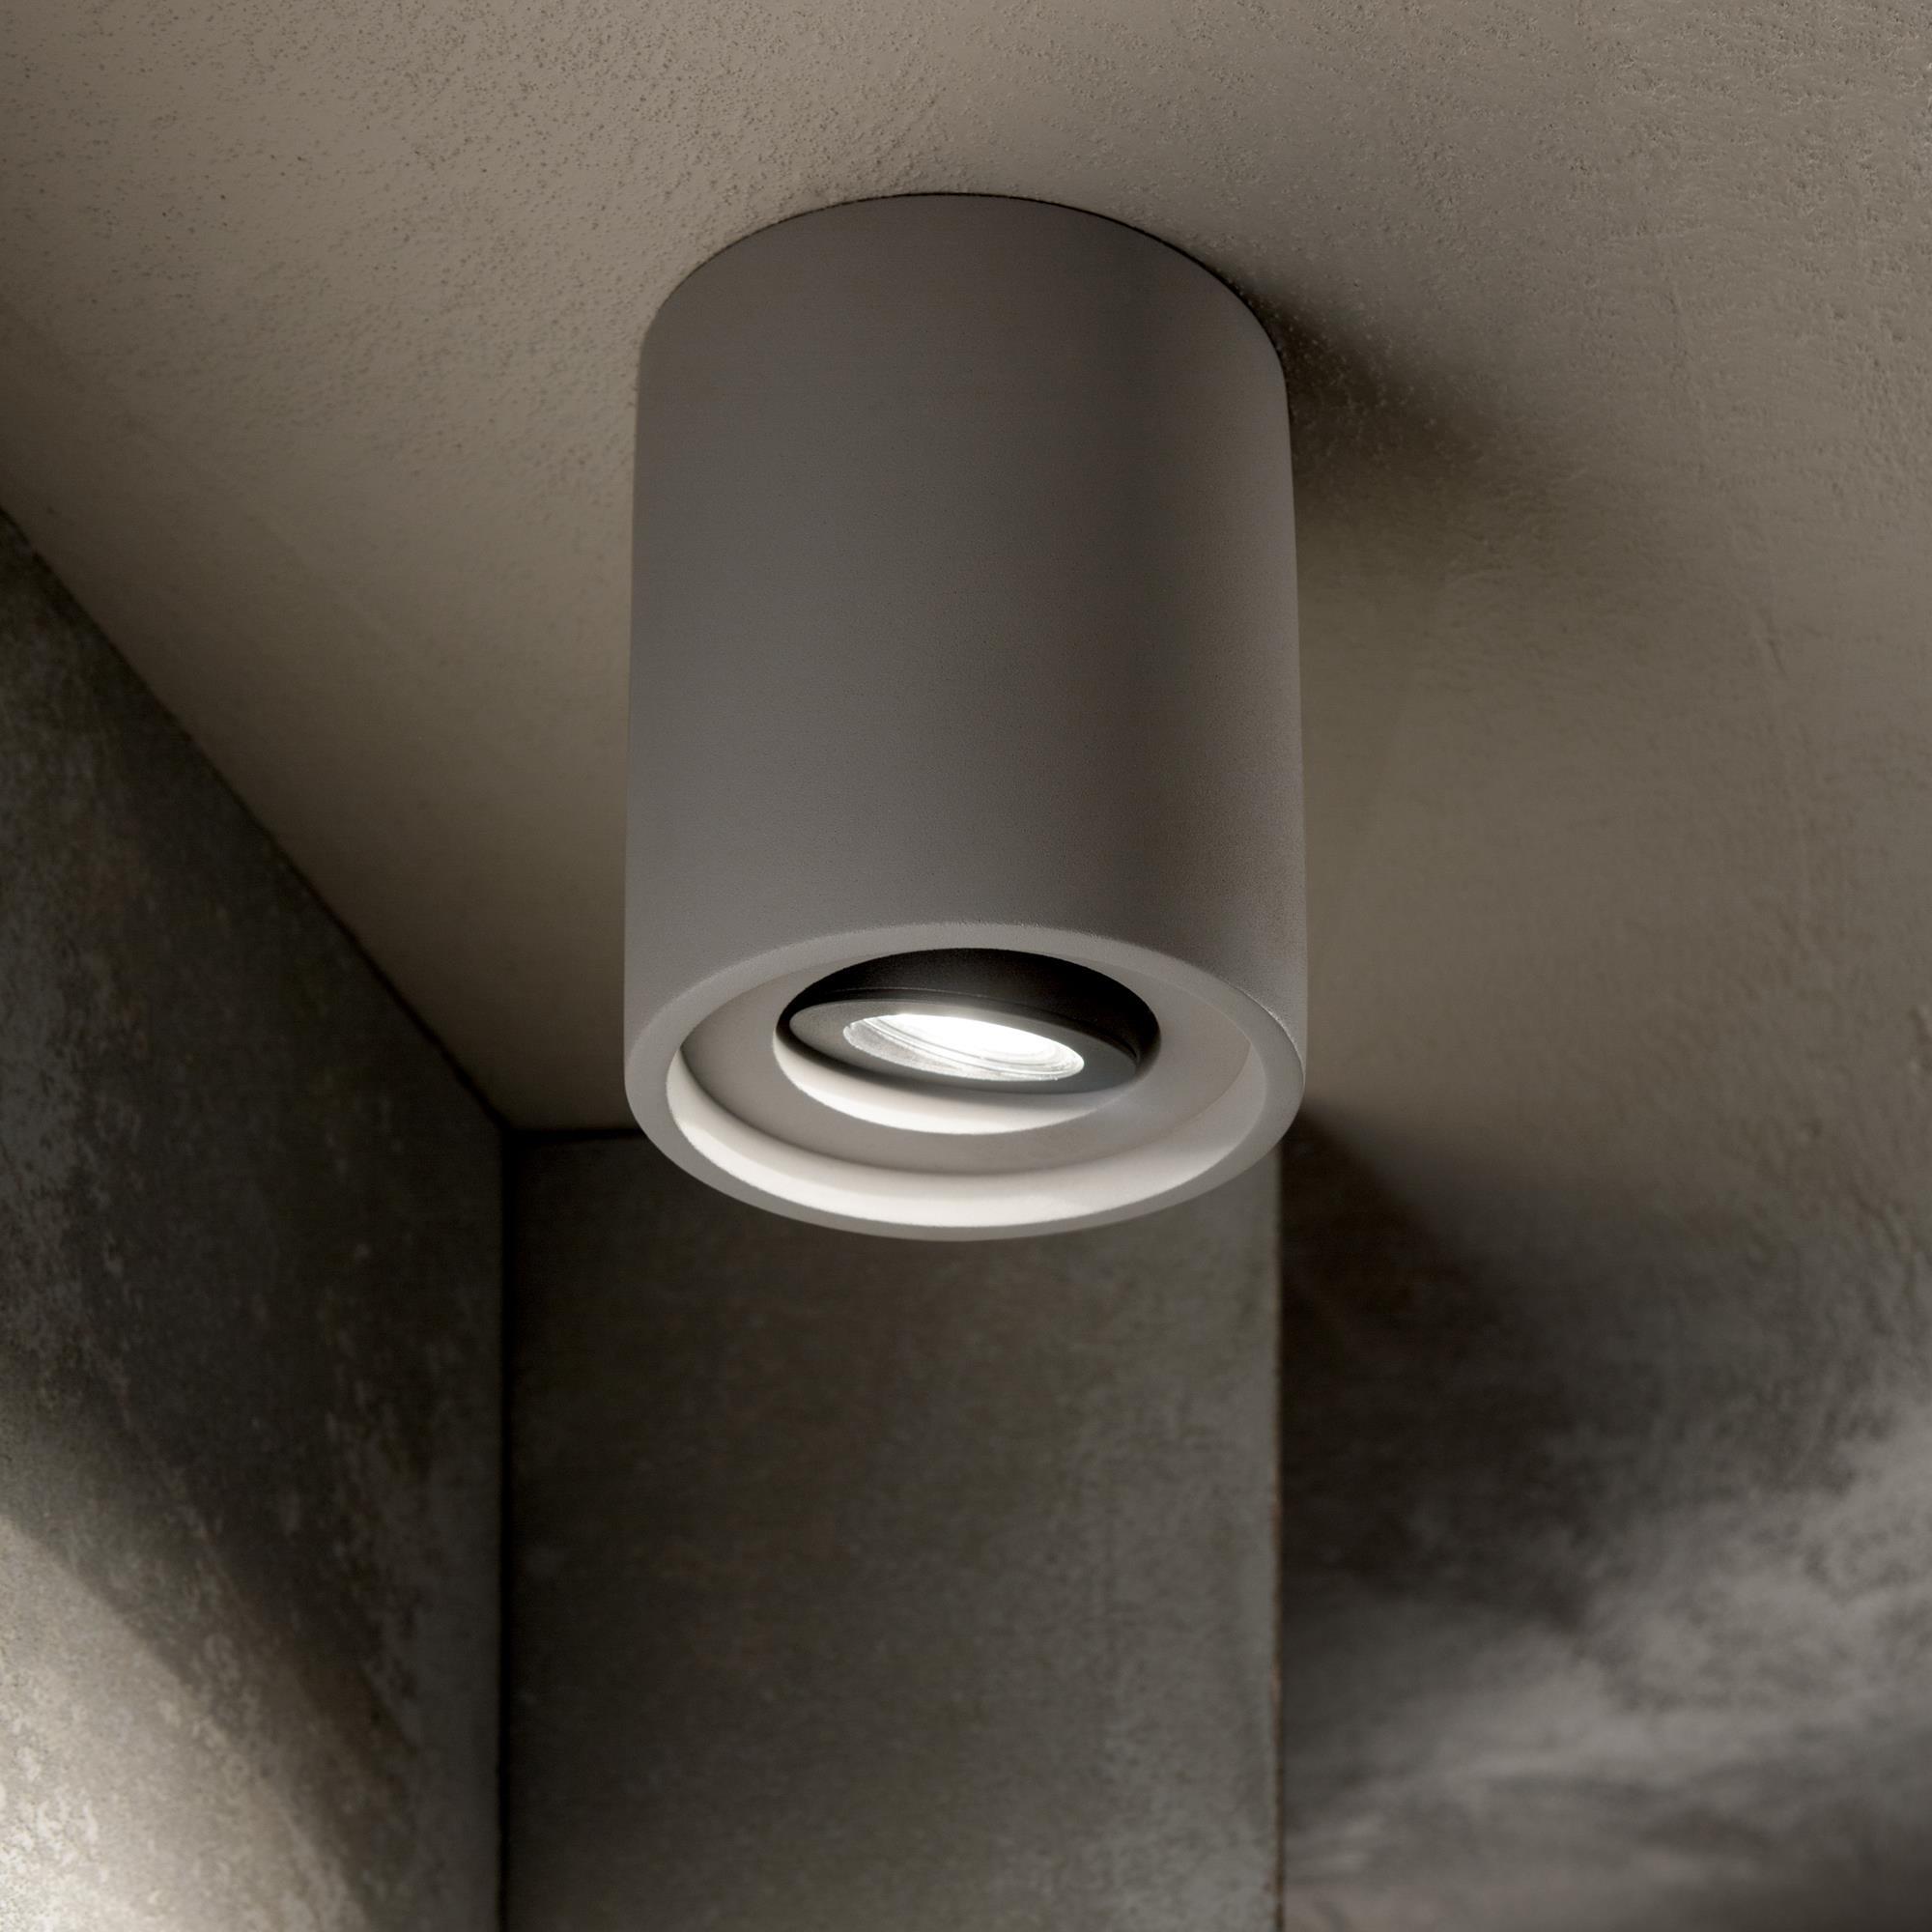 Ideal Lux 150437 OAK PL1 ROUND CEMENTO mennyezeti lámpa